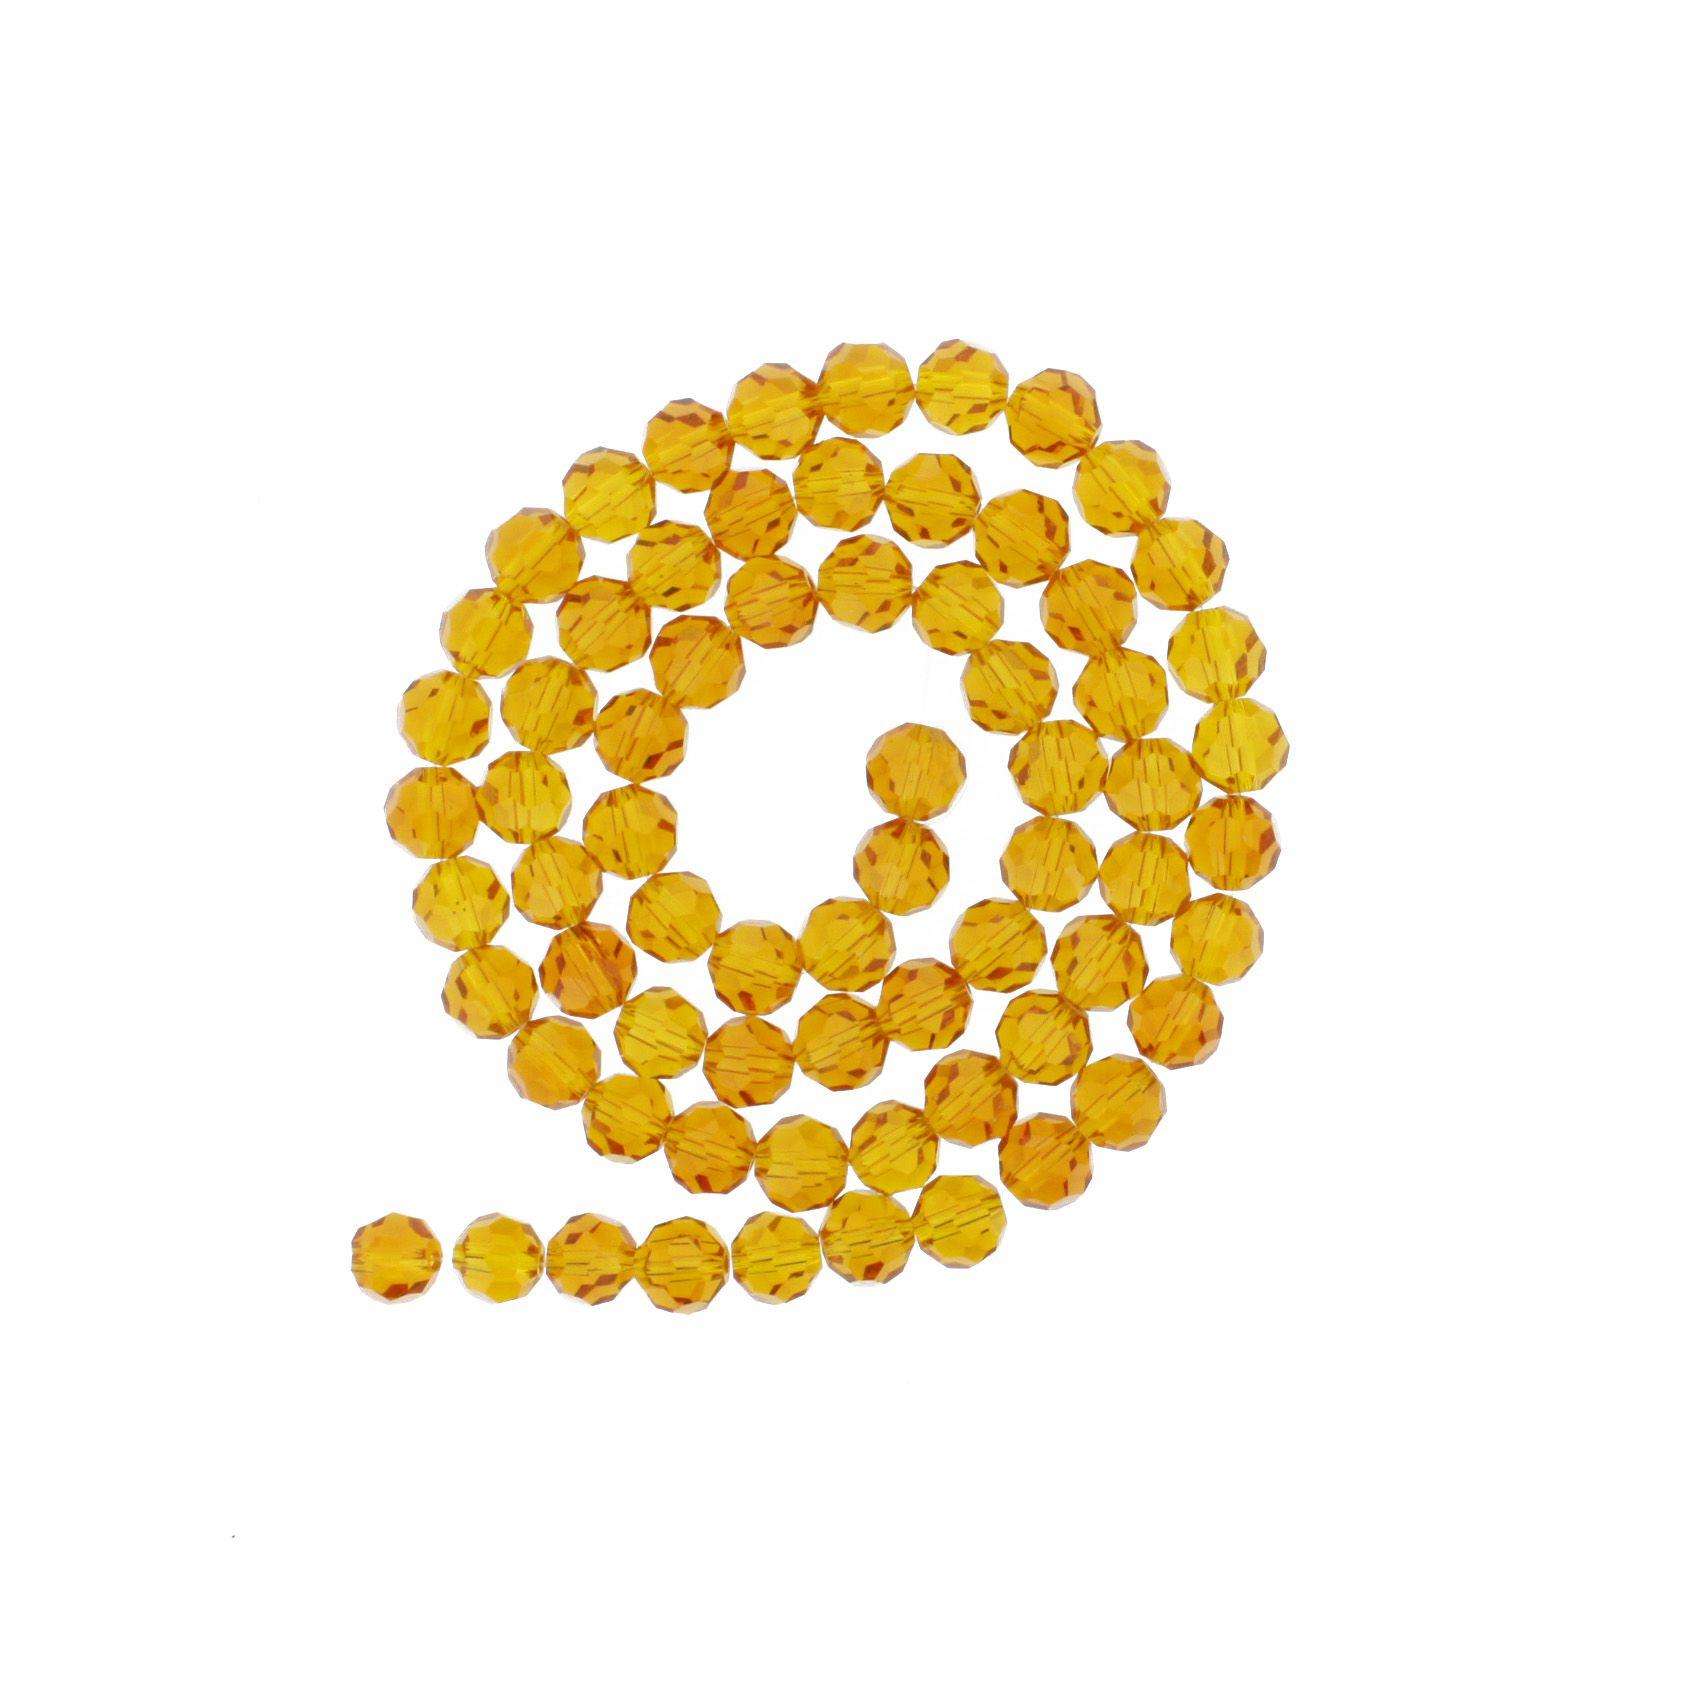 Fio de Cristal - Premium® - Laranja Transparente - 8mm  - Stéphanie Bijoux® - Peças para Bijuterias e Artesanato